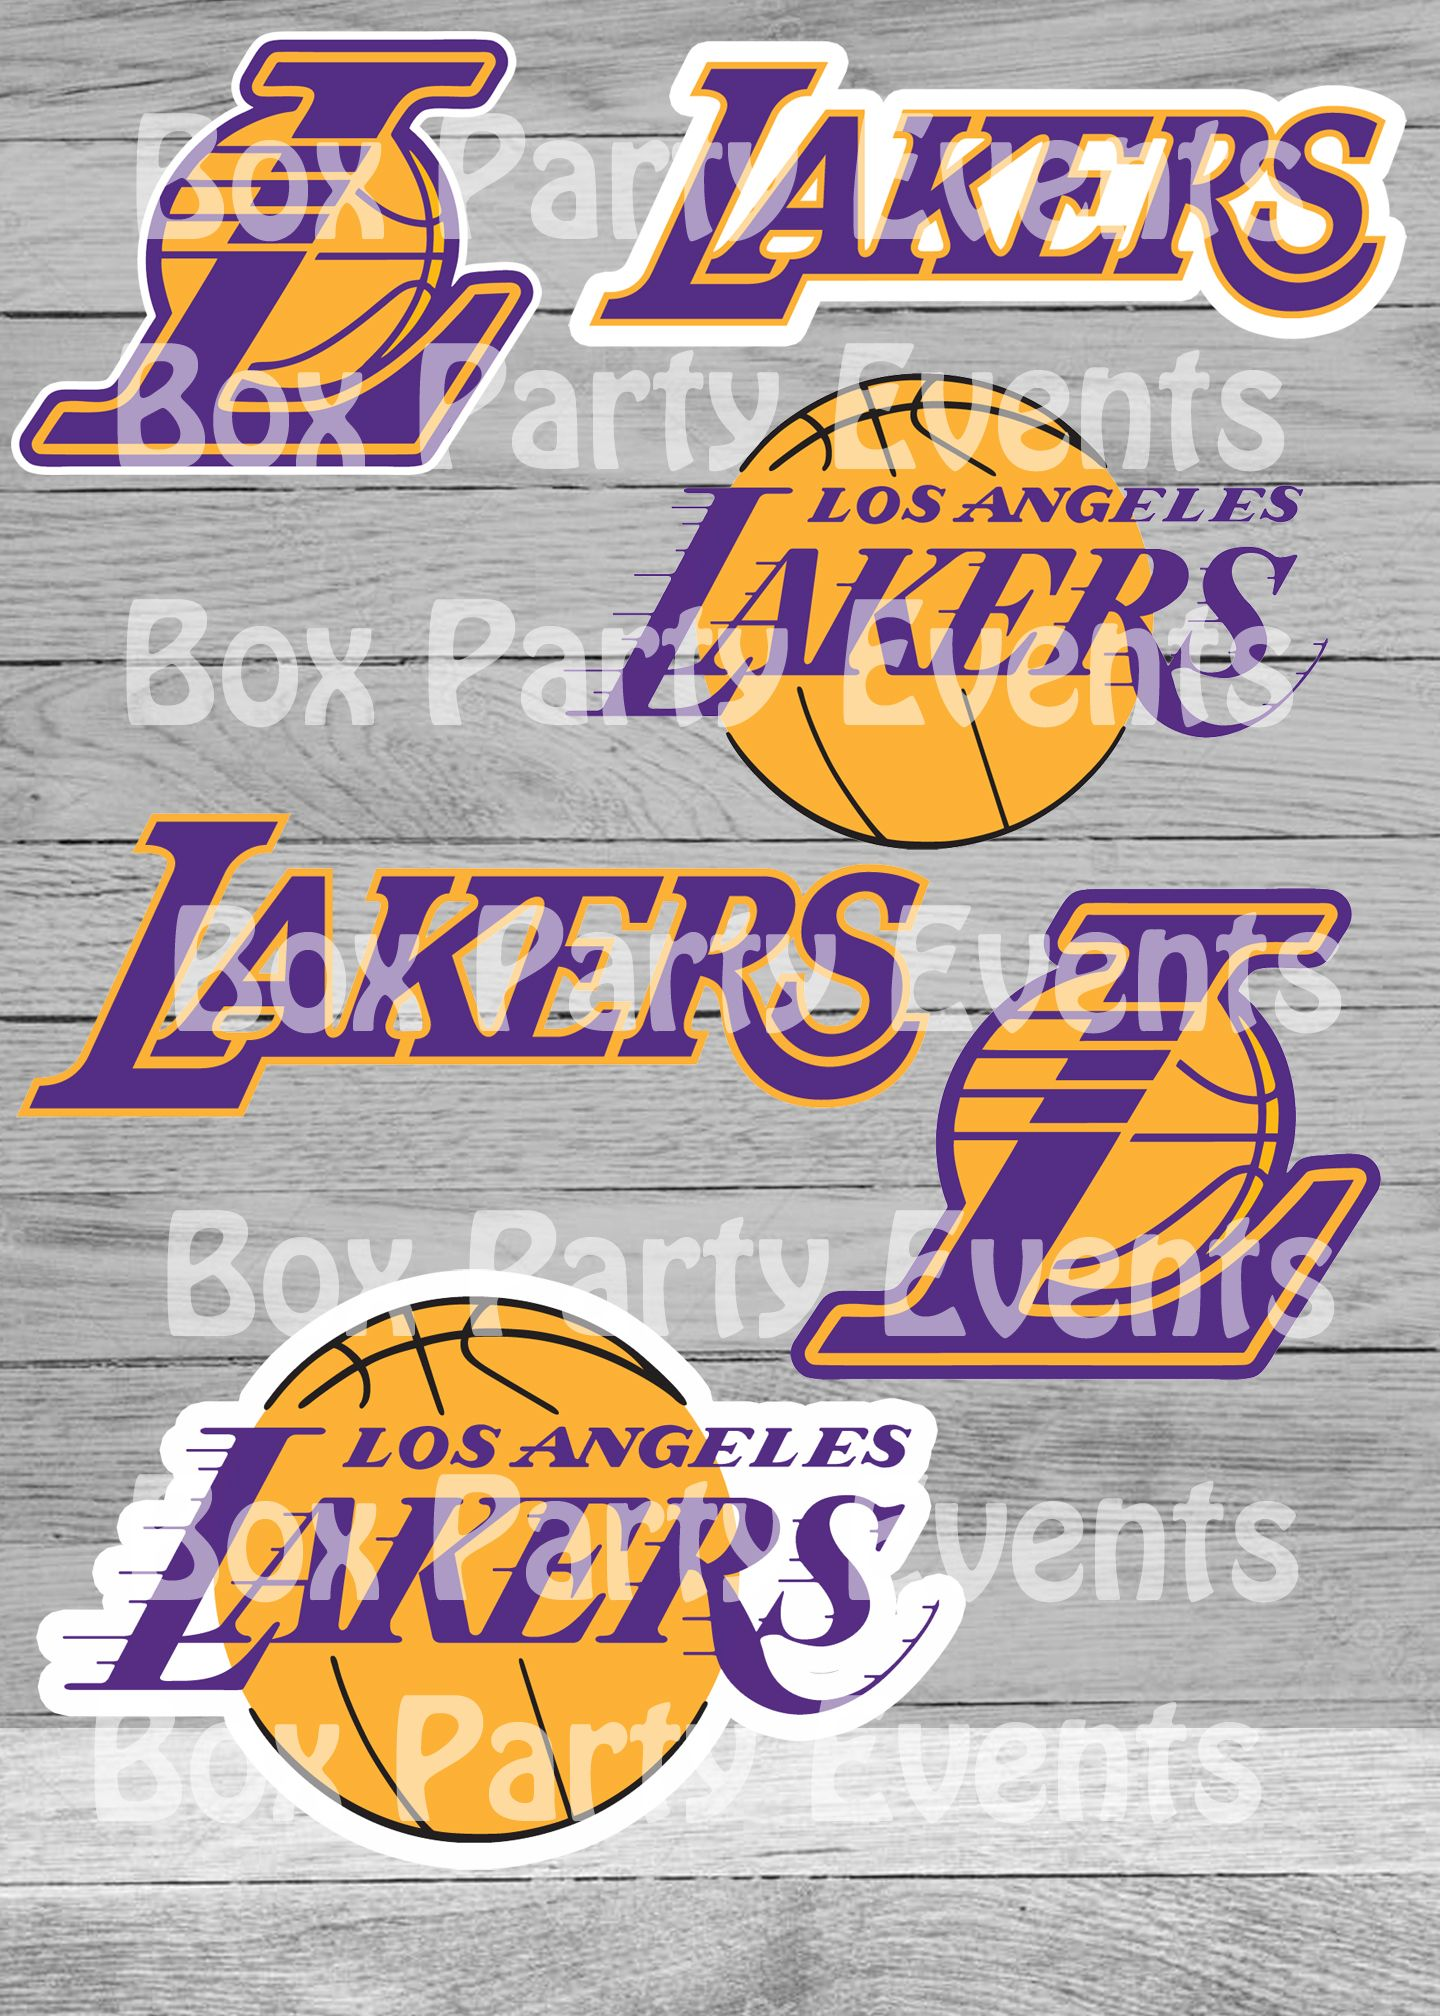 Los Angeles Lakers Svg Files In 2020 Los Angeles Lakers Lakers Logo La Lakers